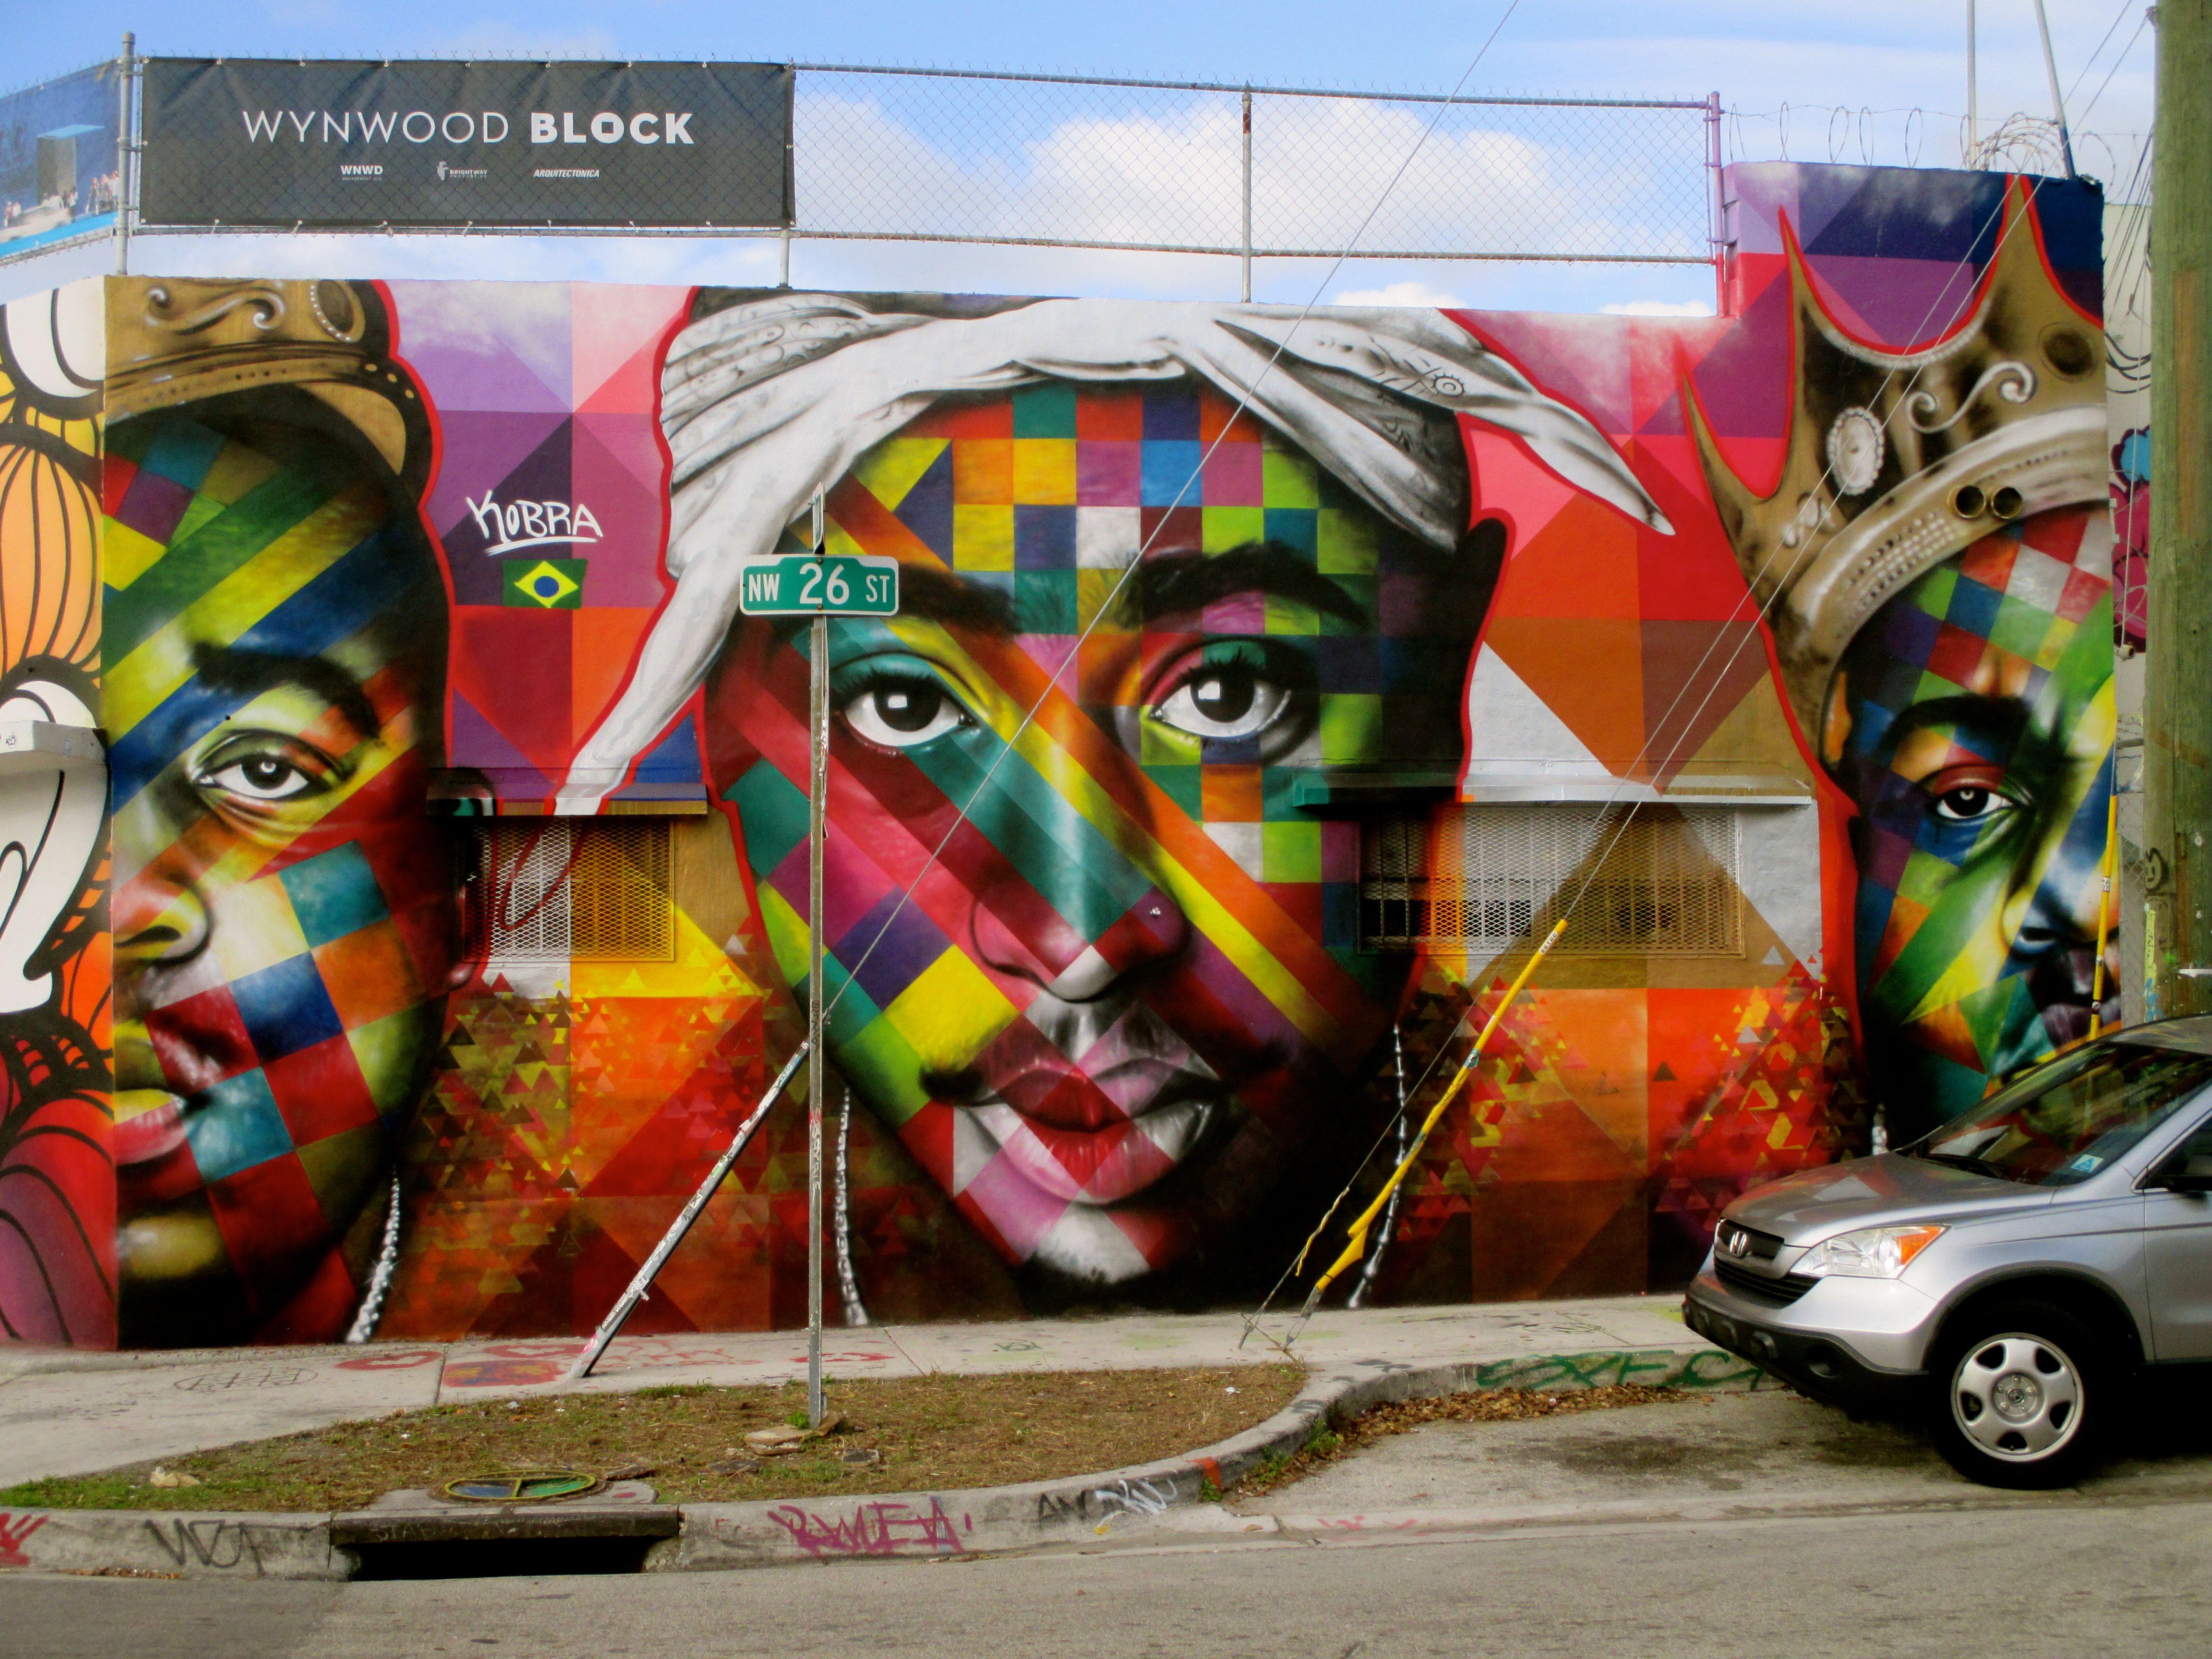 Wynwood Walls Street Art Art Miami | Miami Wynwood Street ...